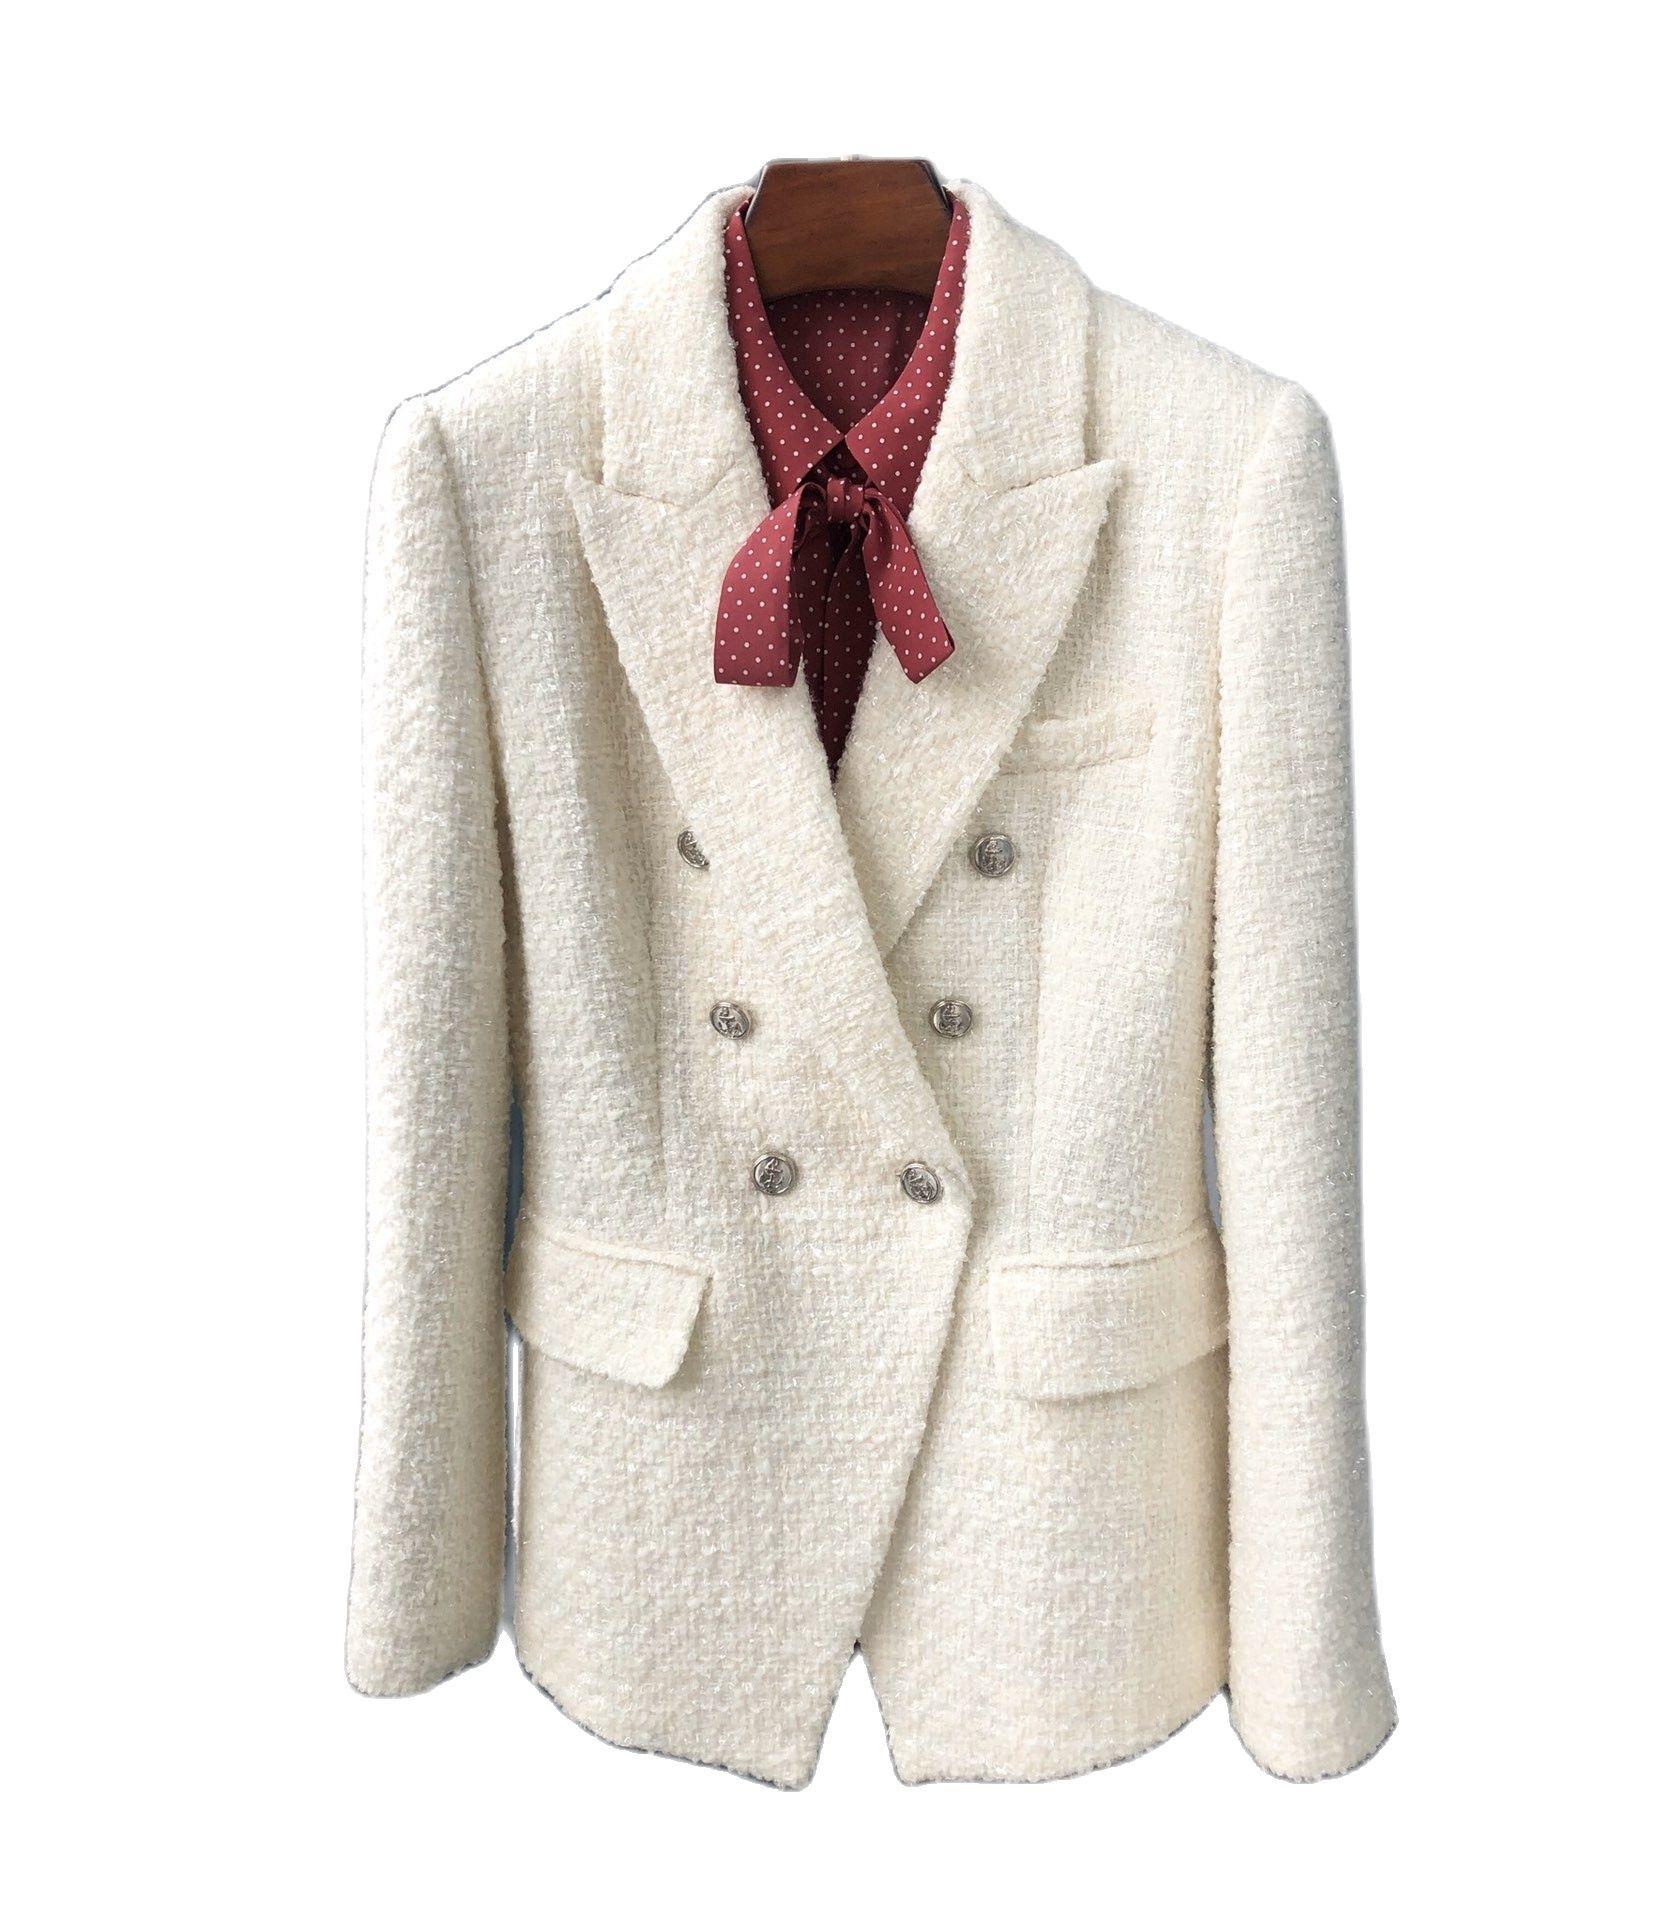 2021new women beige tweed suit fashion tweed coat women jackets women's double breasted jackets white tweed jackets dropshipping